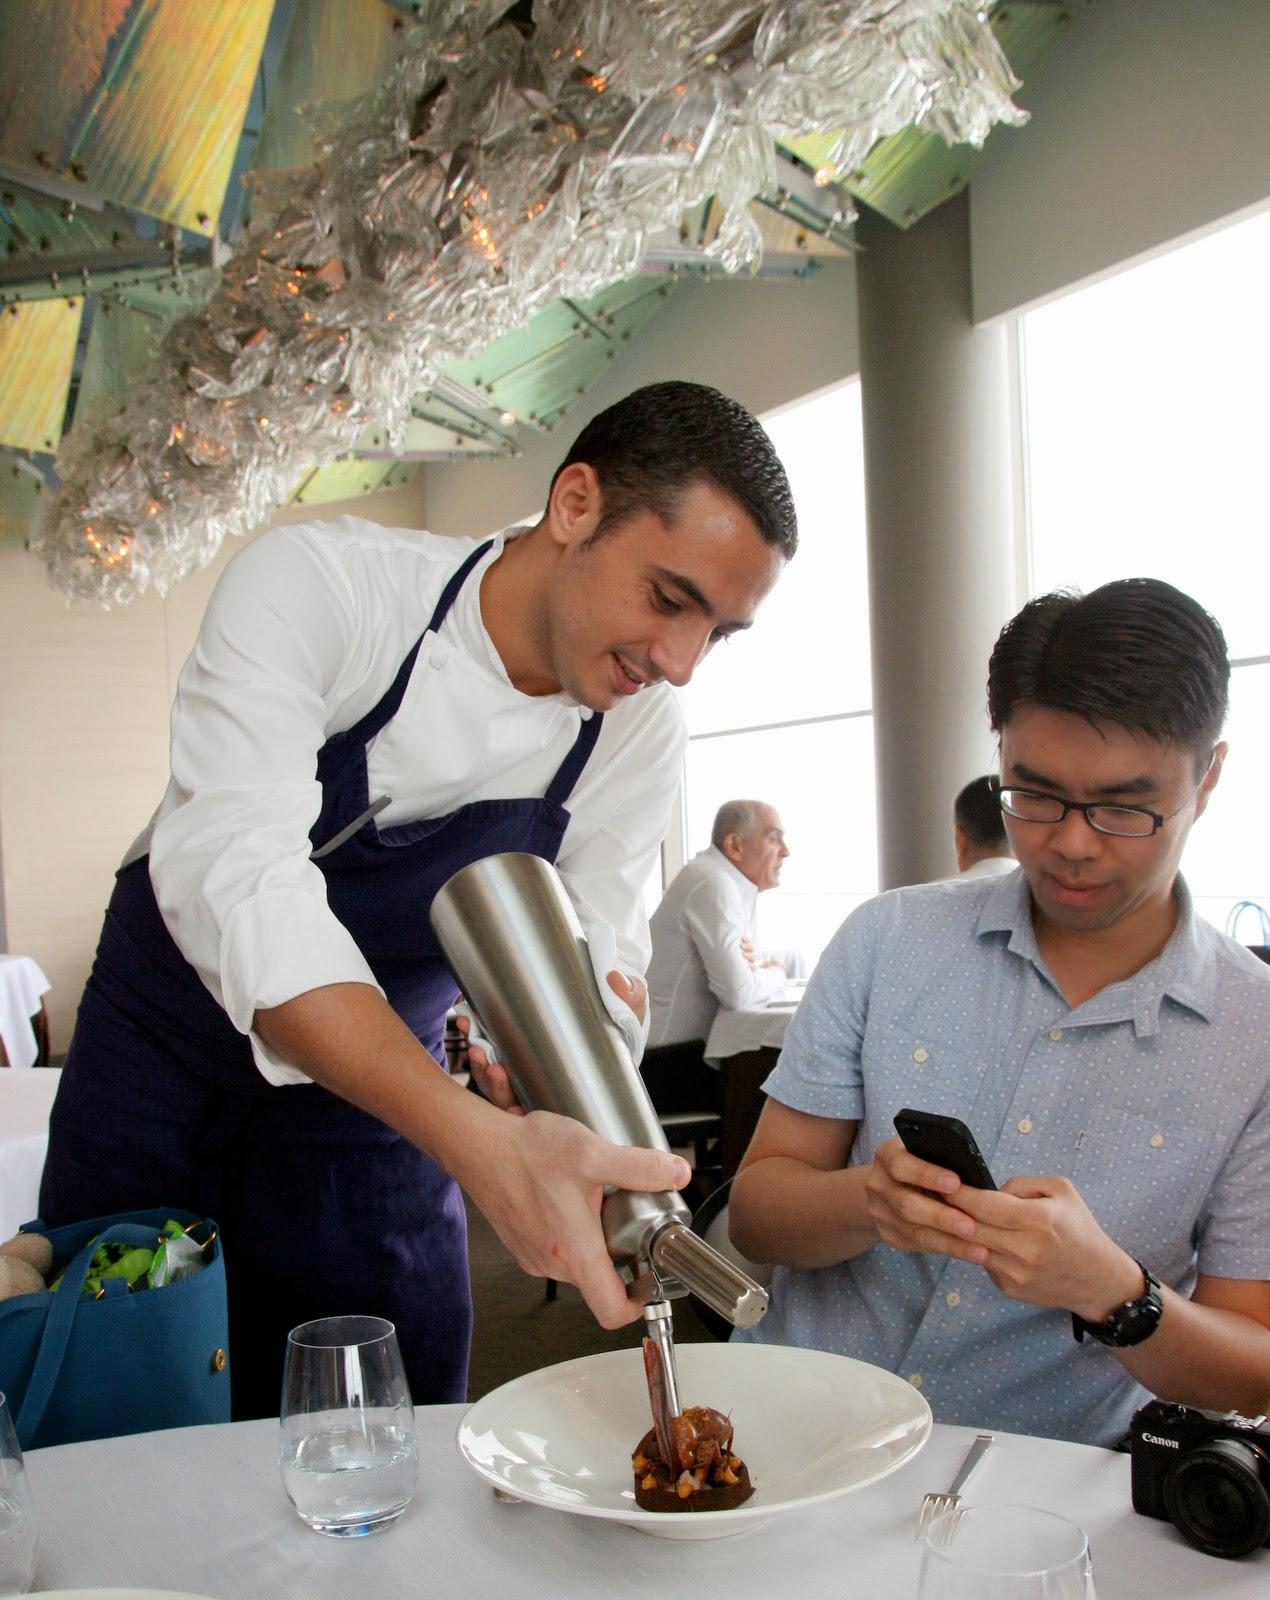 Jaan Lunch At Swissotel The Stamford Autumnwinter Menu Celebrates